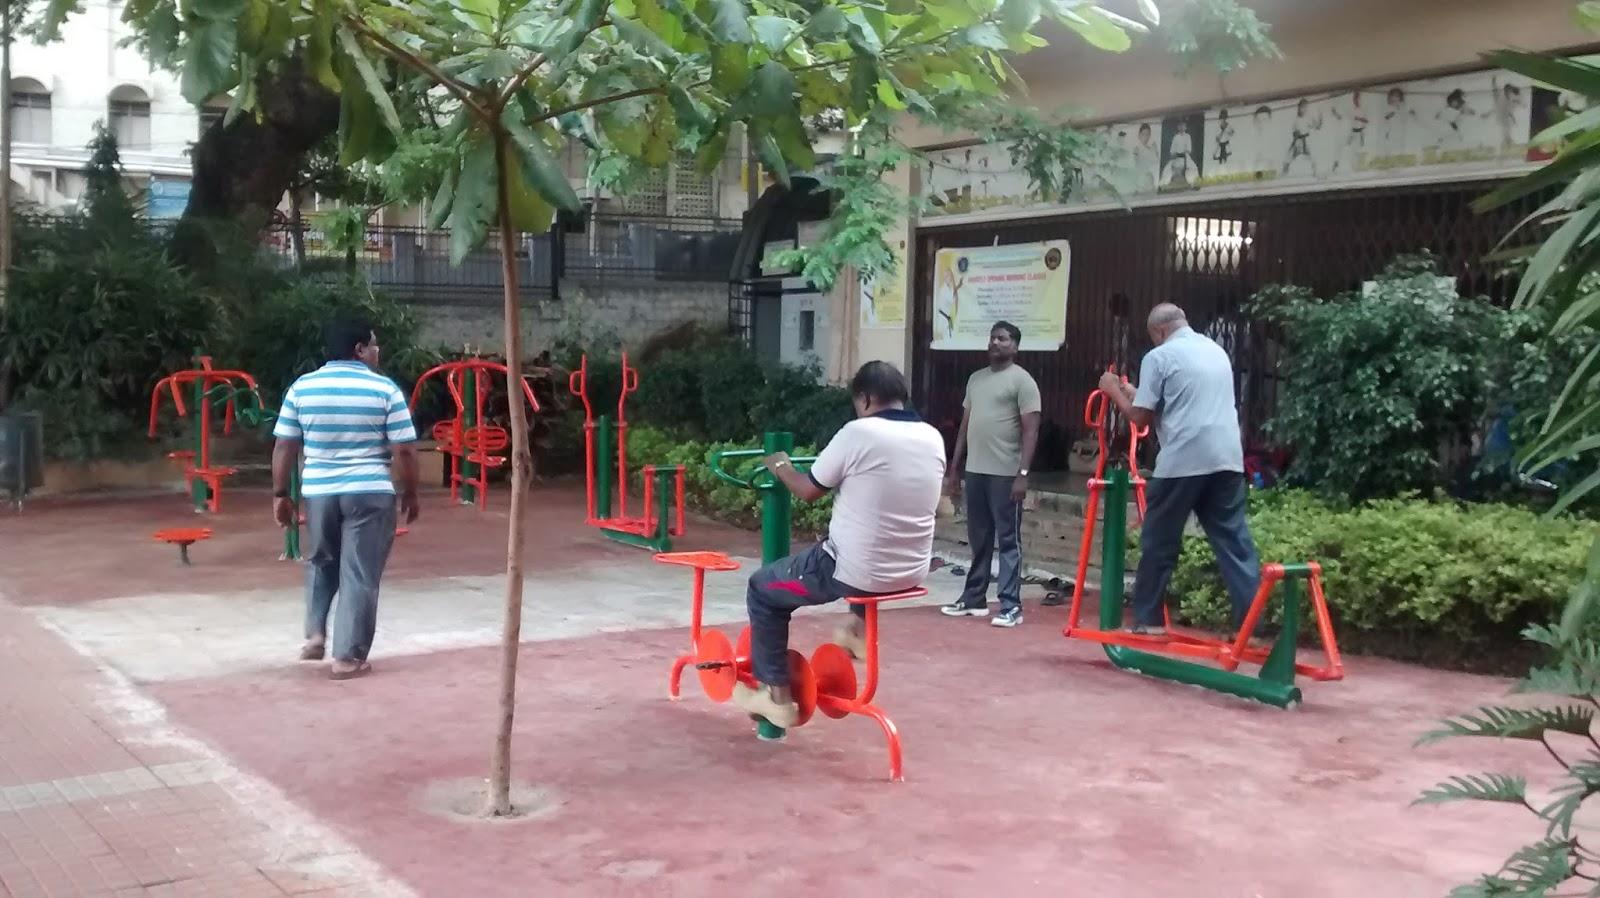 Affordable gym equipment in sheshadripuram park blr for Gardening tools in bangalore